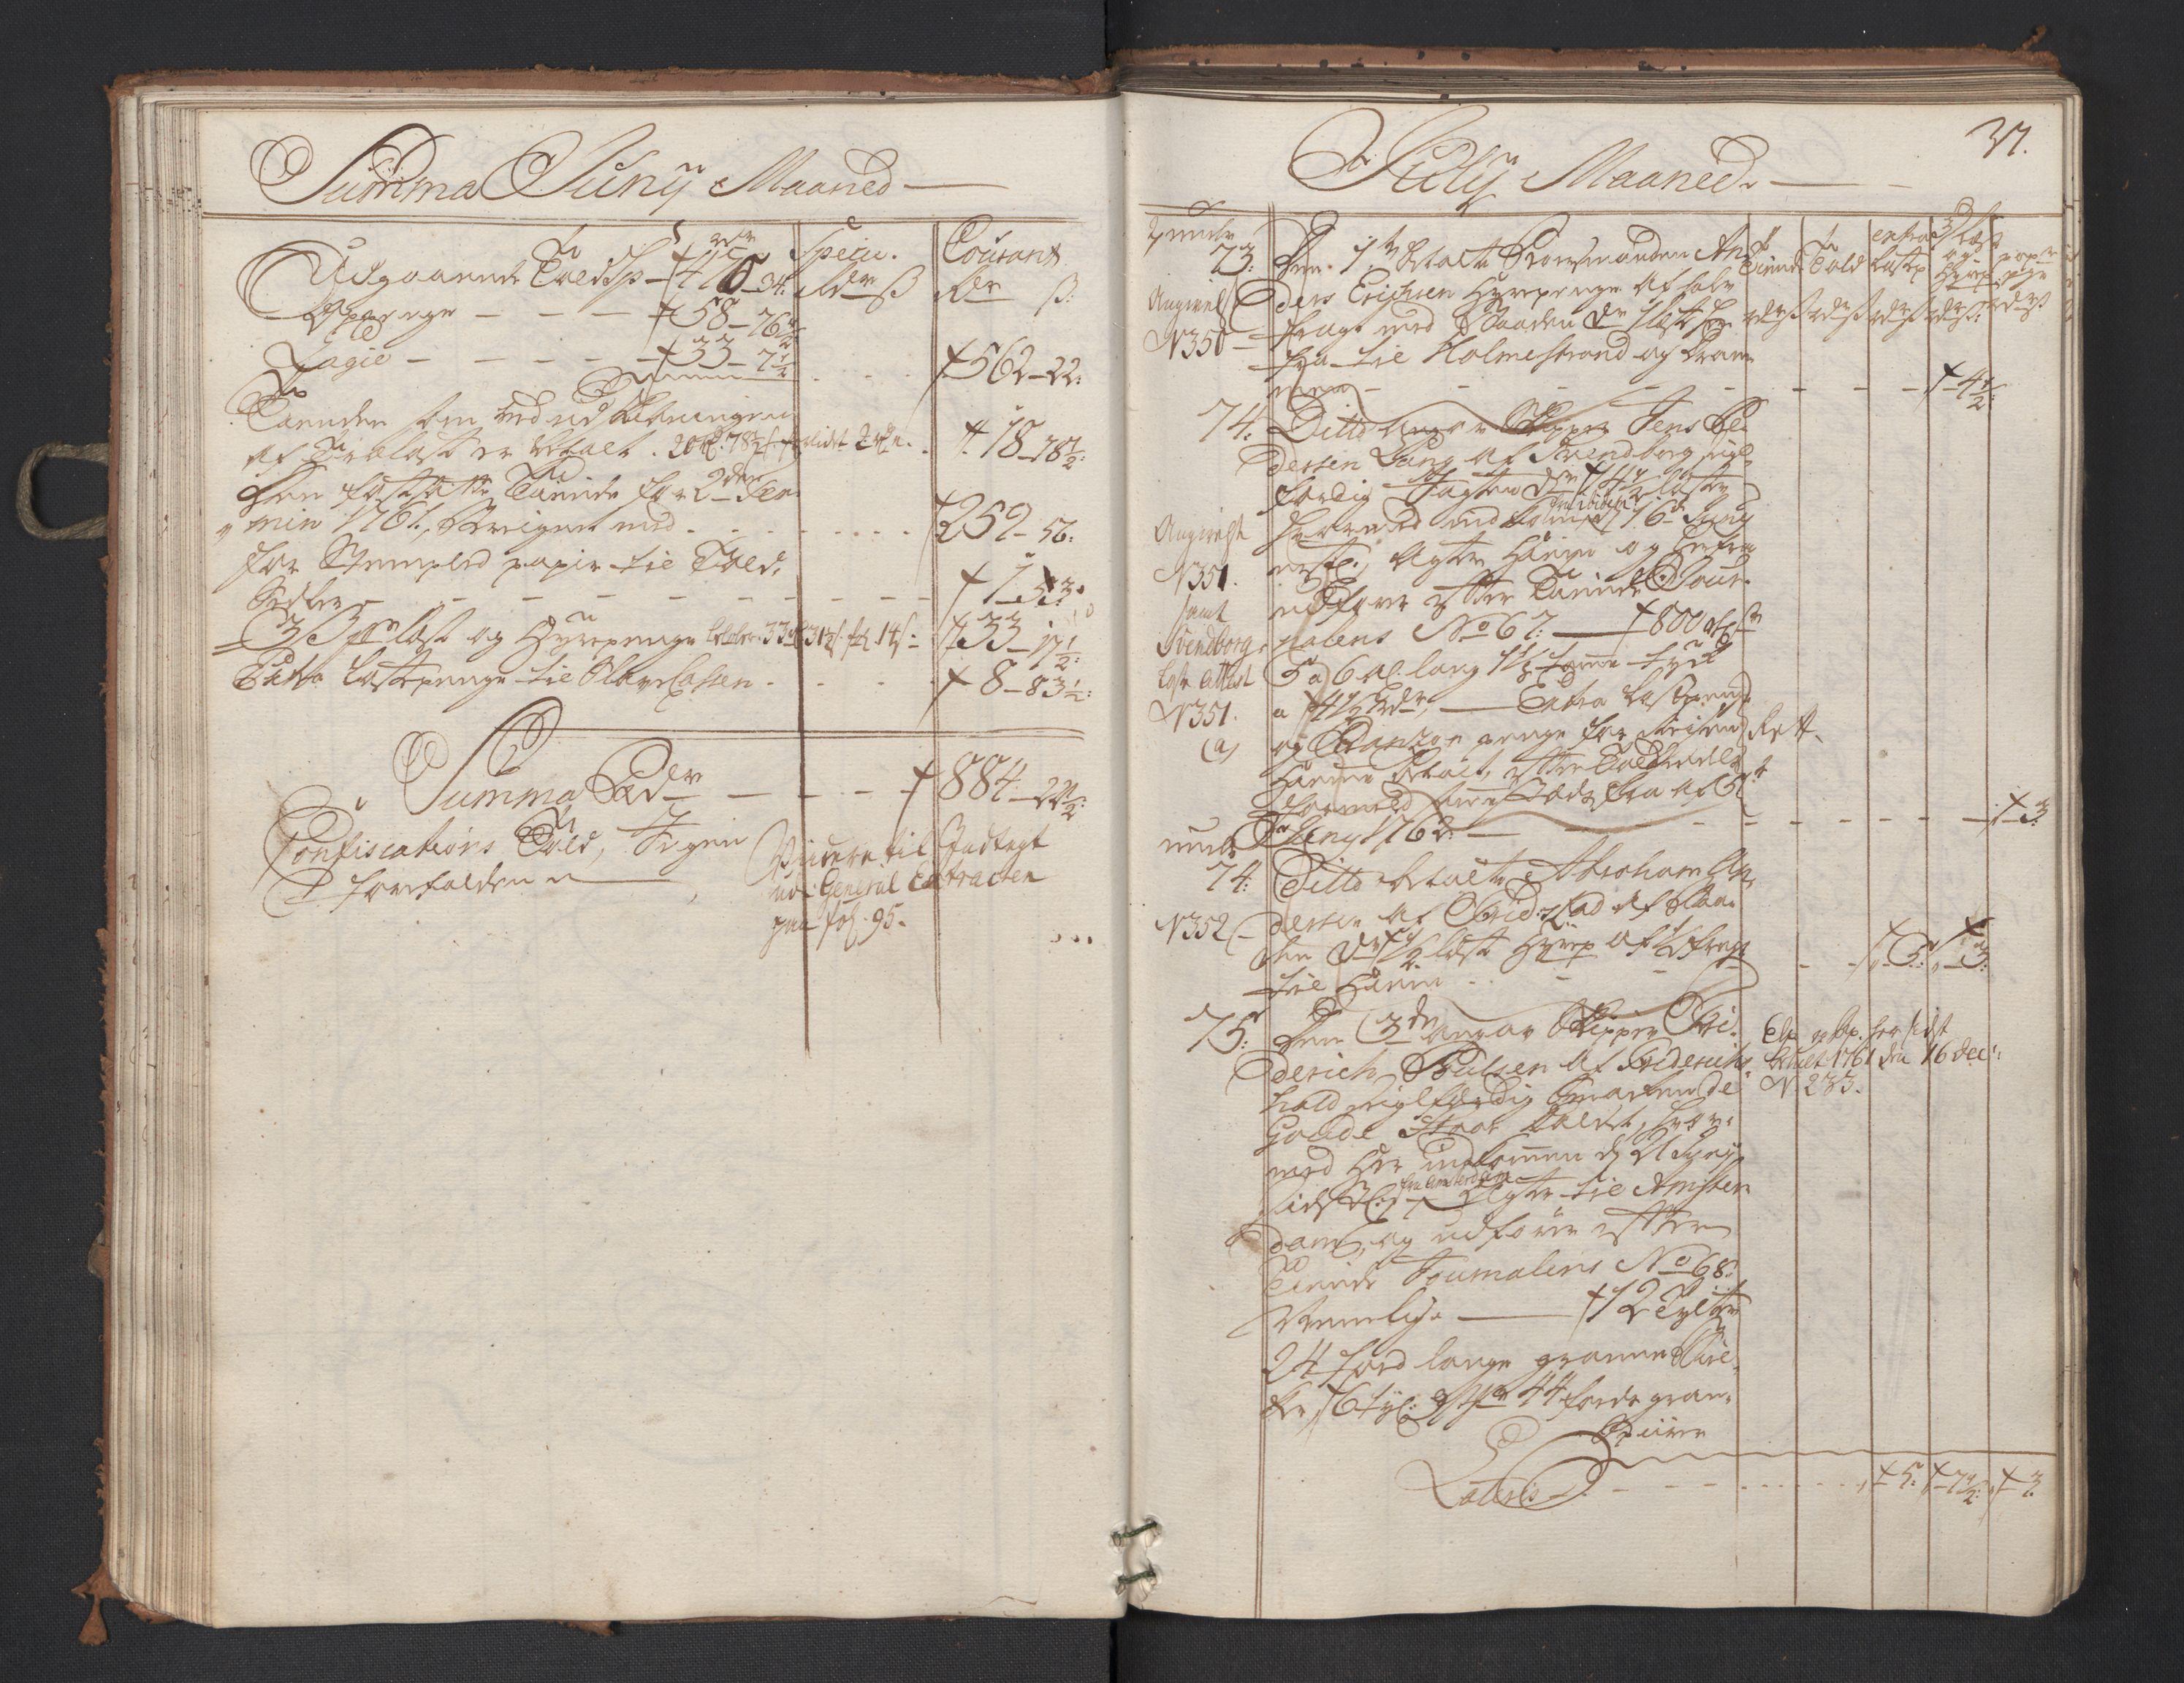 RA, Generaltollkammeret, tollregnskaper, R01/L0047: Tollregnskaper Fredrikshald, 1762, s. 36b-37a